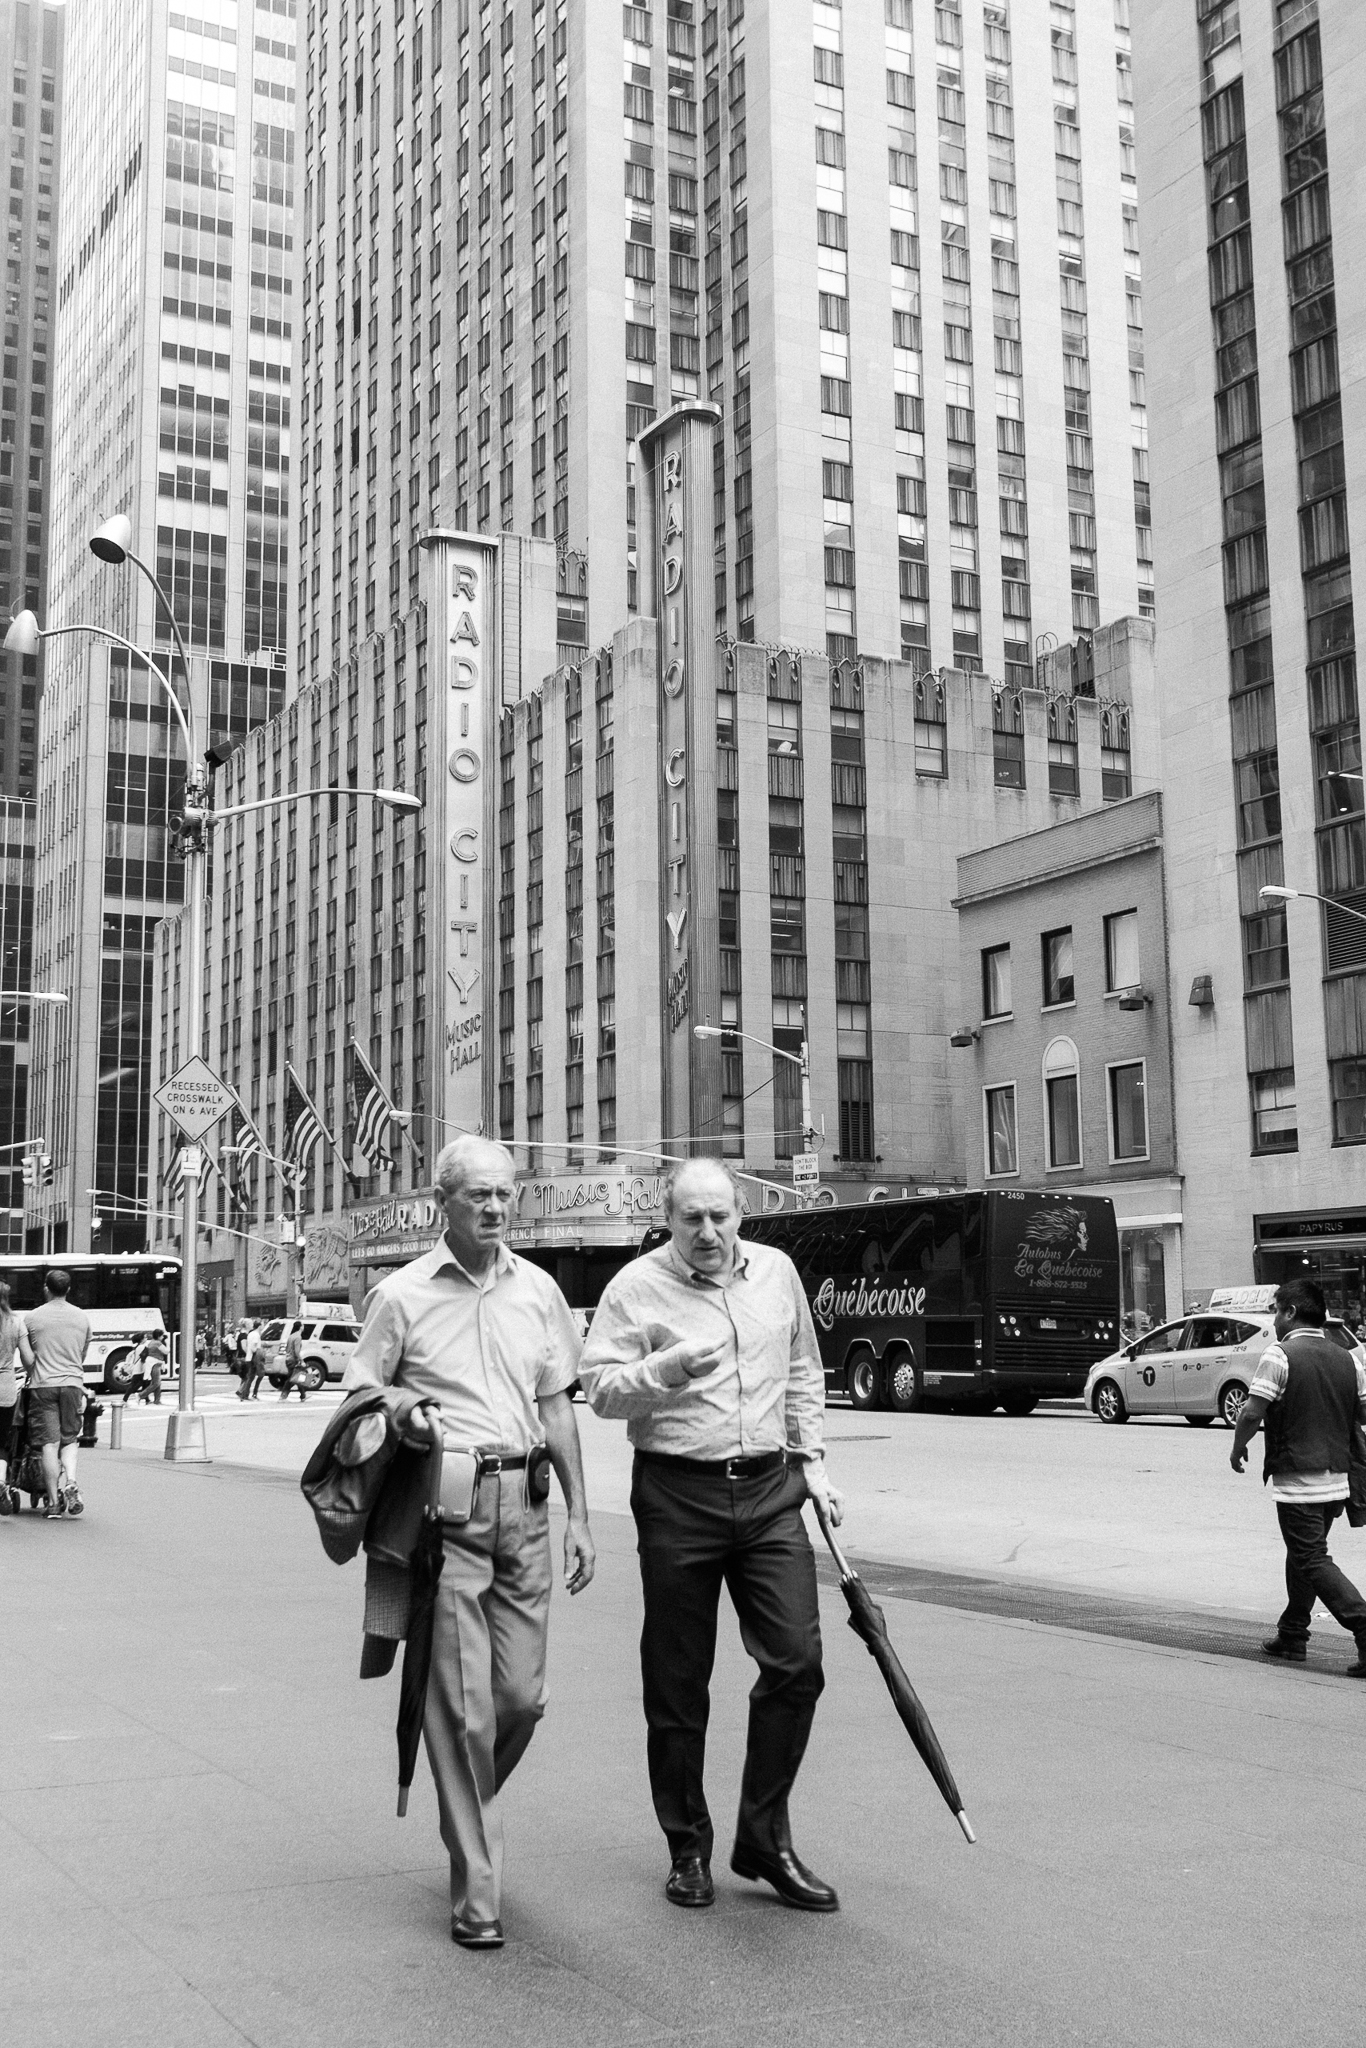 2015-05-14-NYC-0705.jpg